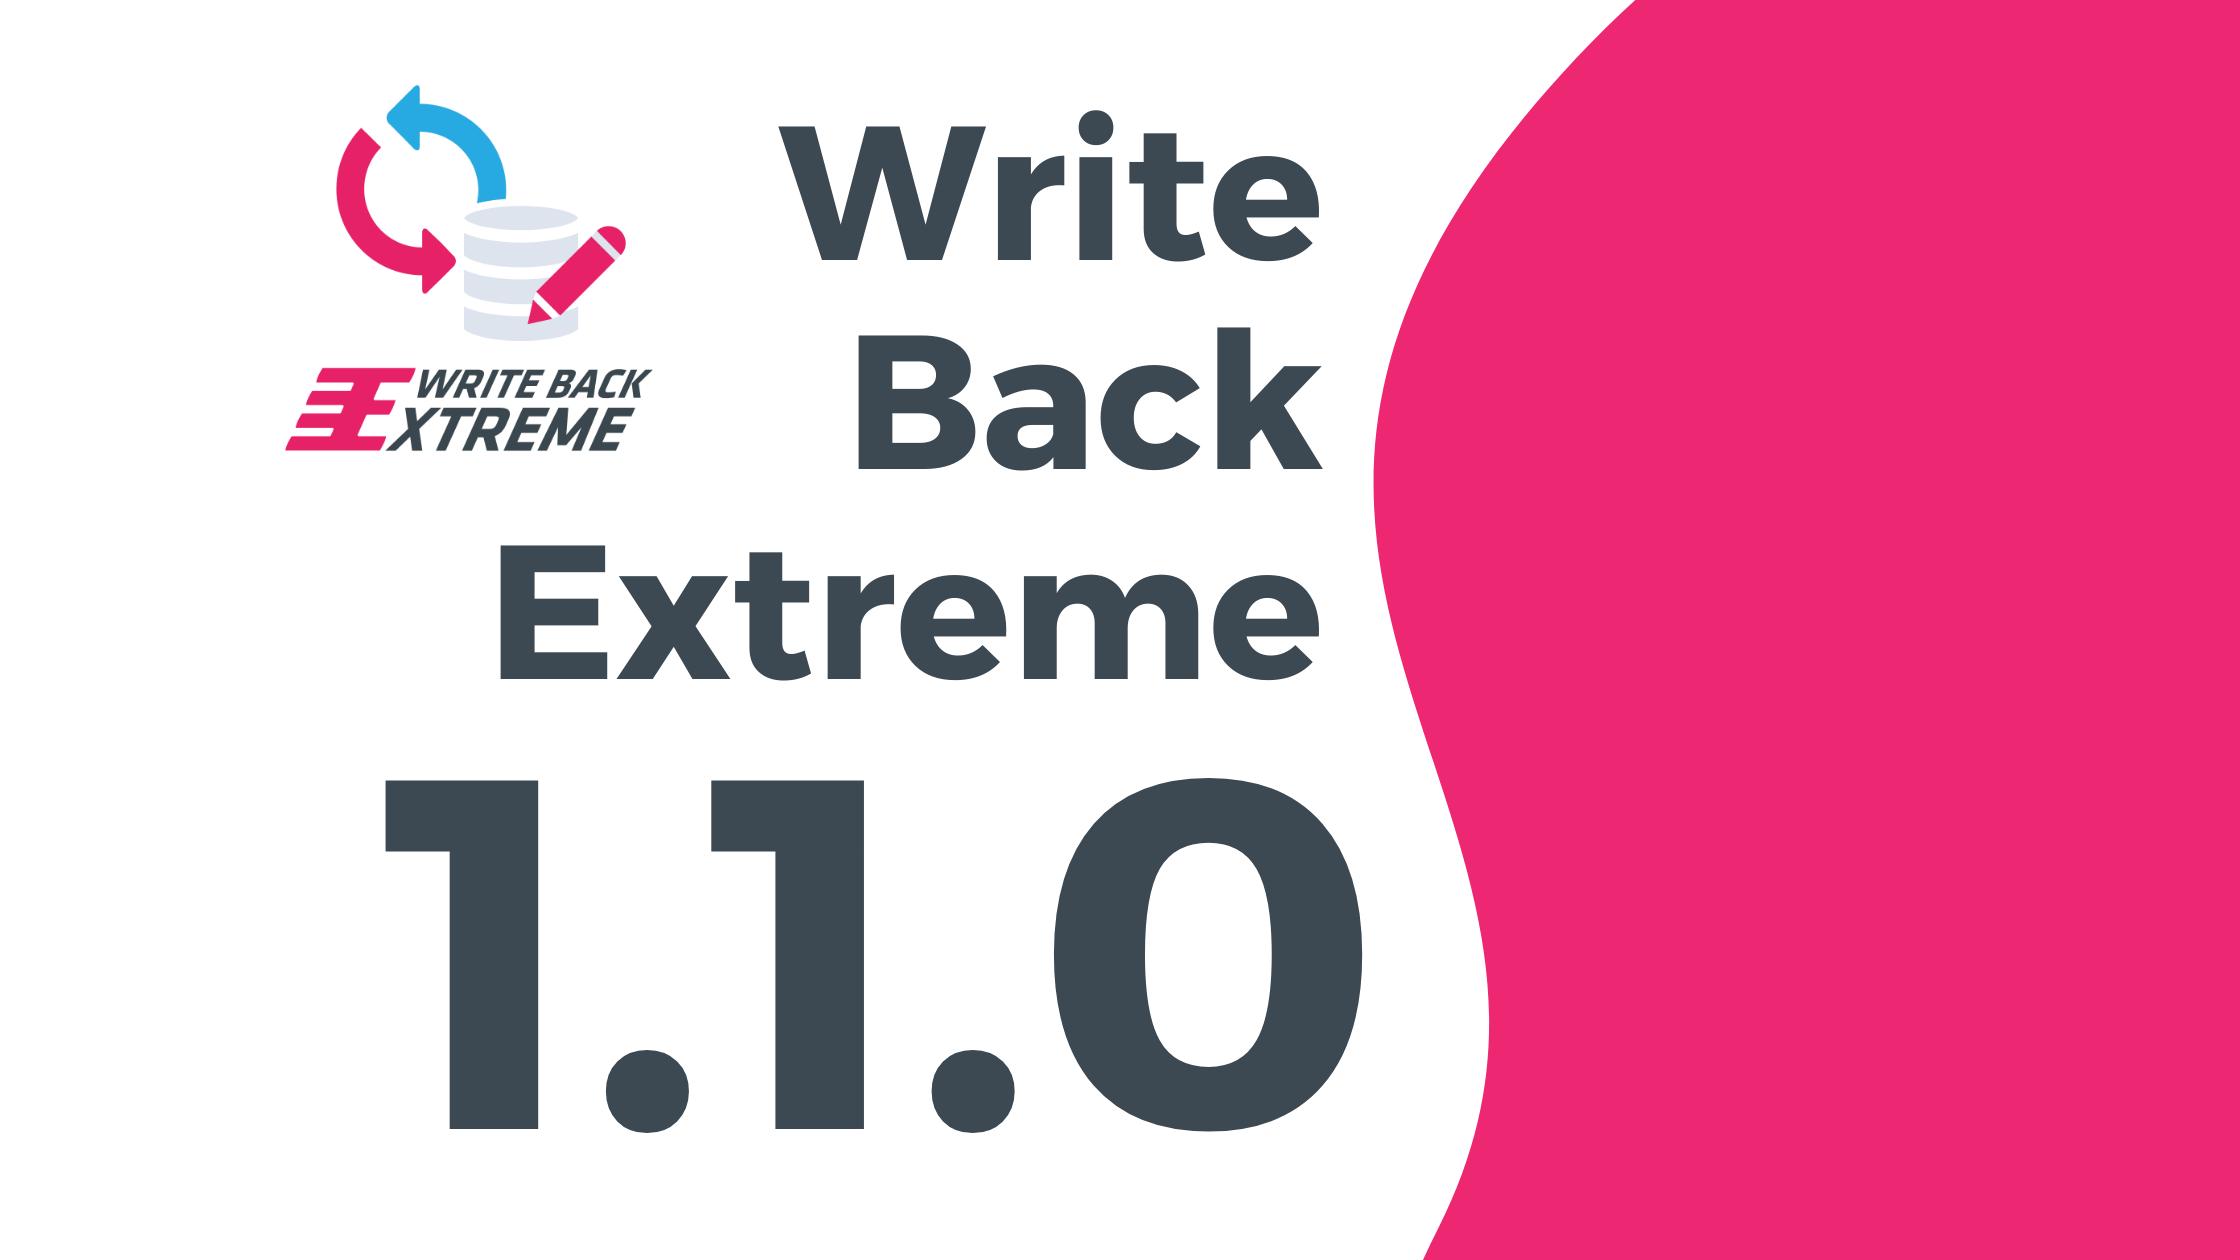 Write Back Extreme update